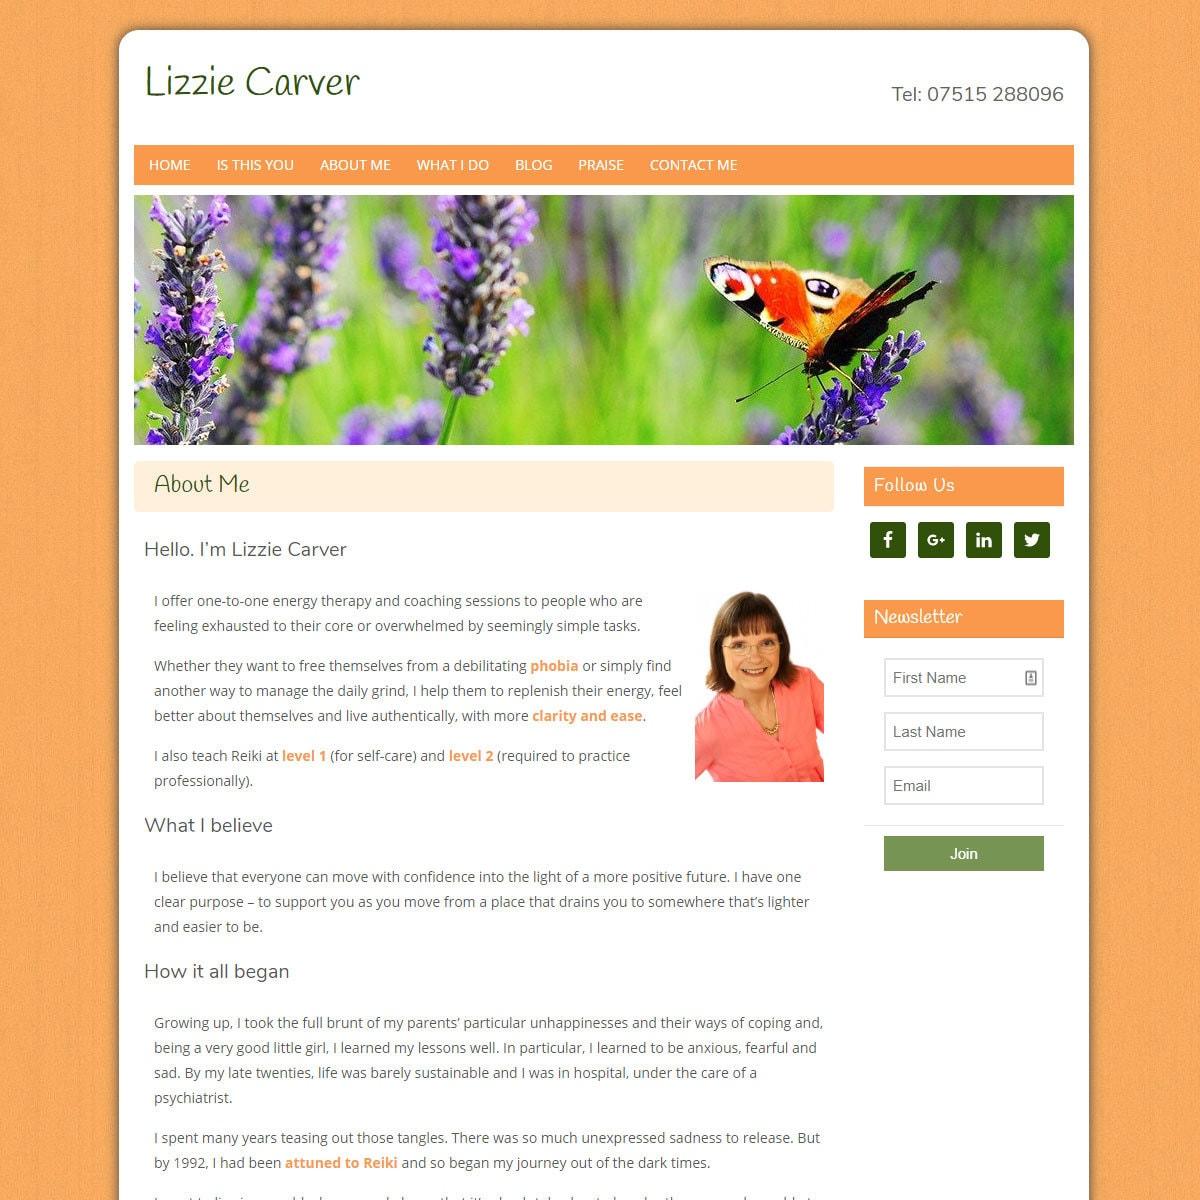 lizzie-carver